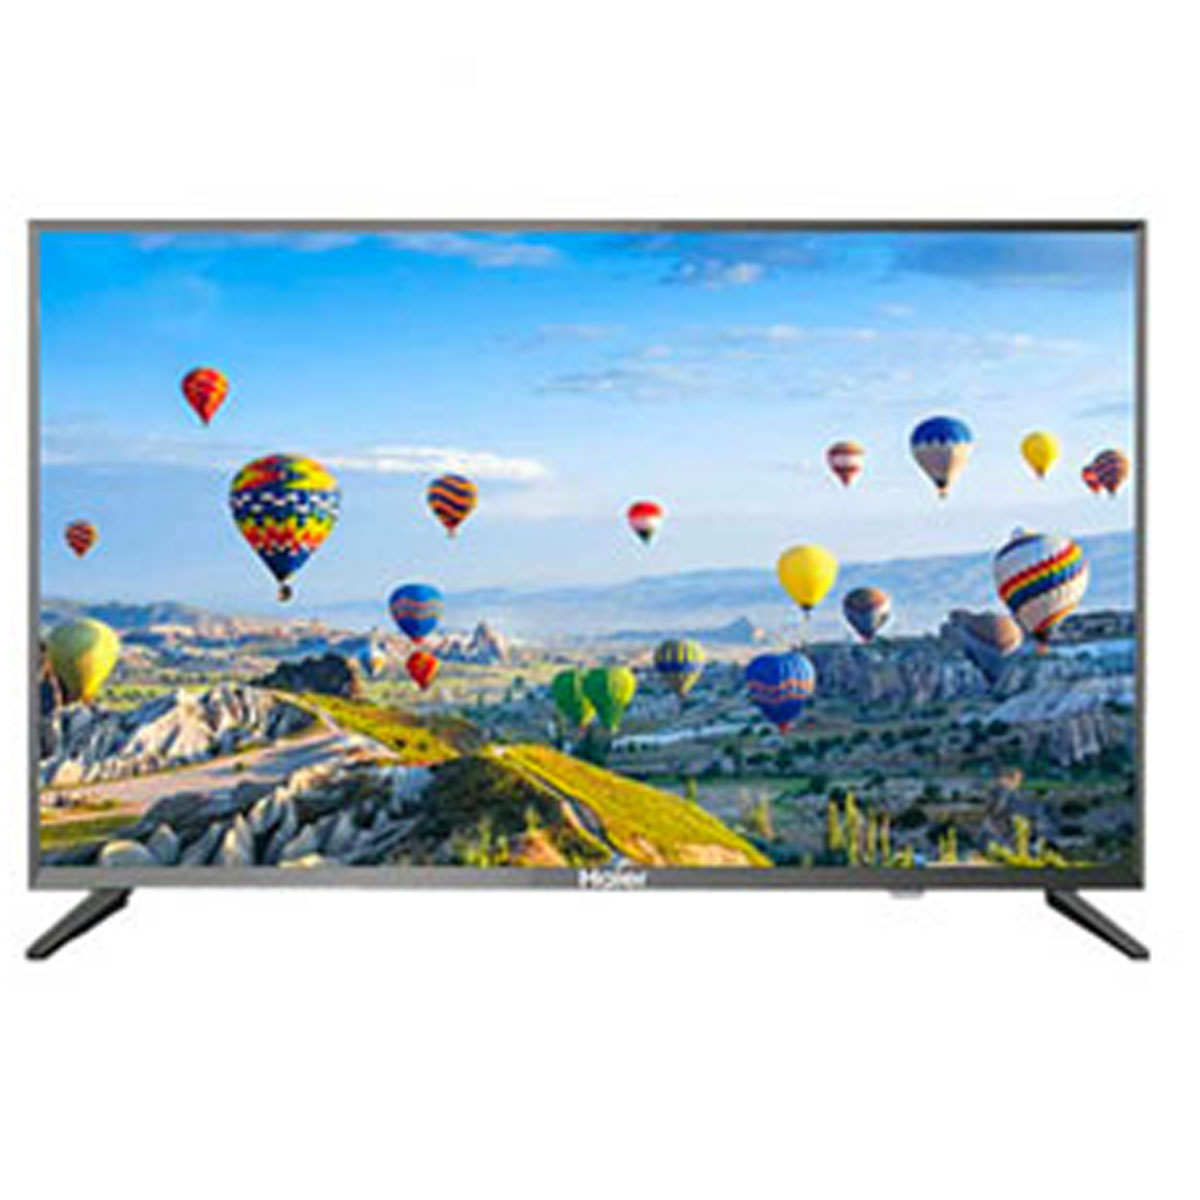 Haier 40 Inch Smart HD LED TV (LE40K6600G)